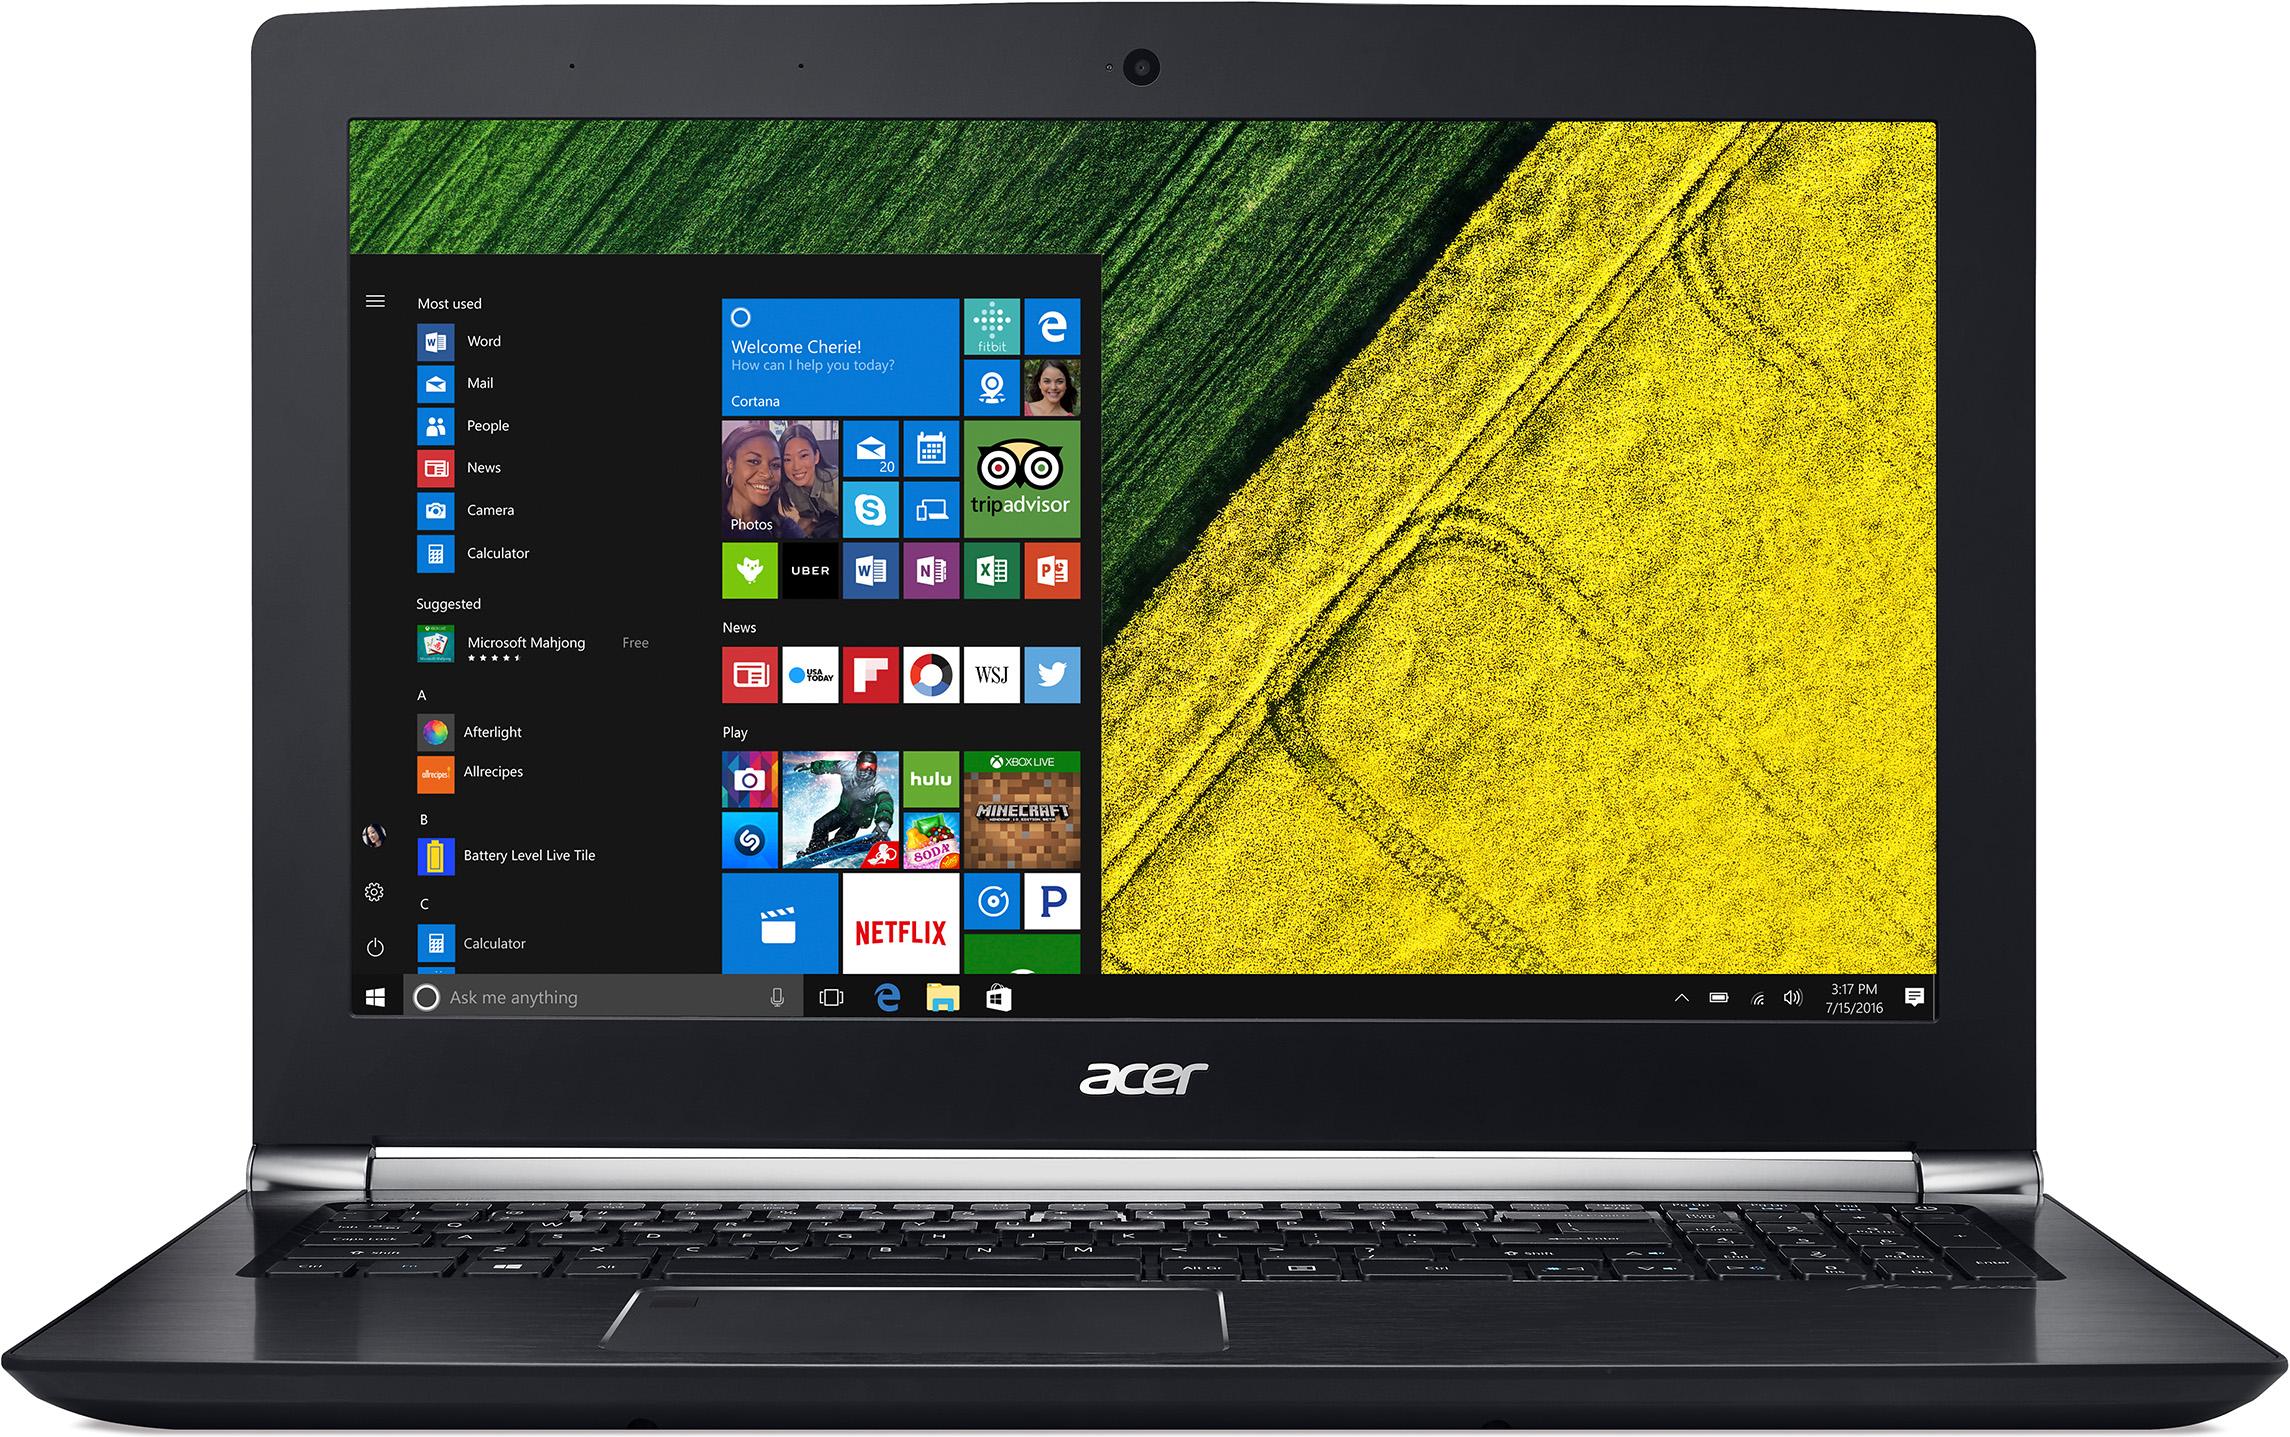 Acer Aspire V Nitro VN7-593G-74FW Laptop